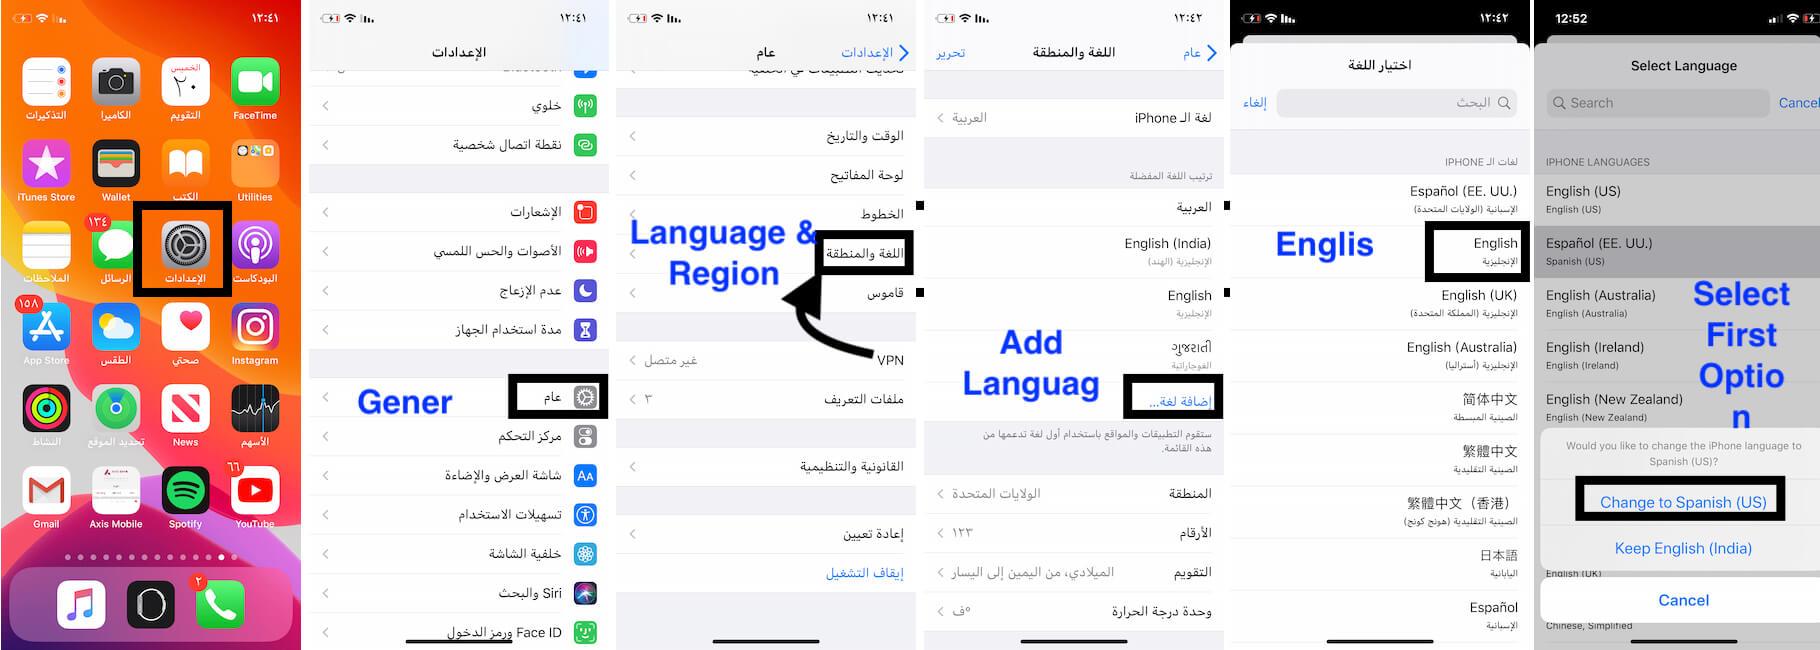 Arabic to English change language on iPhone